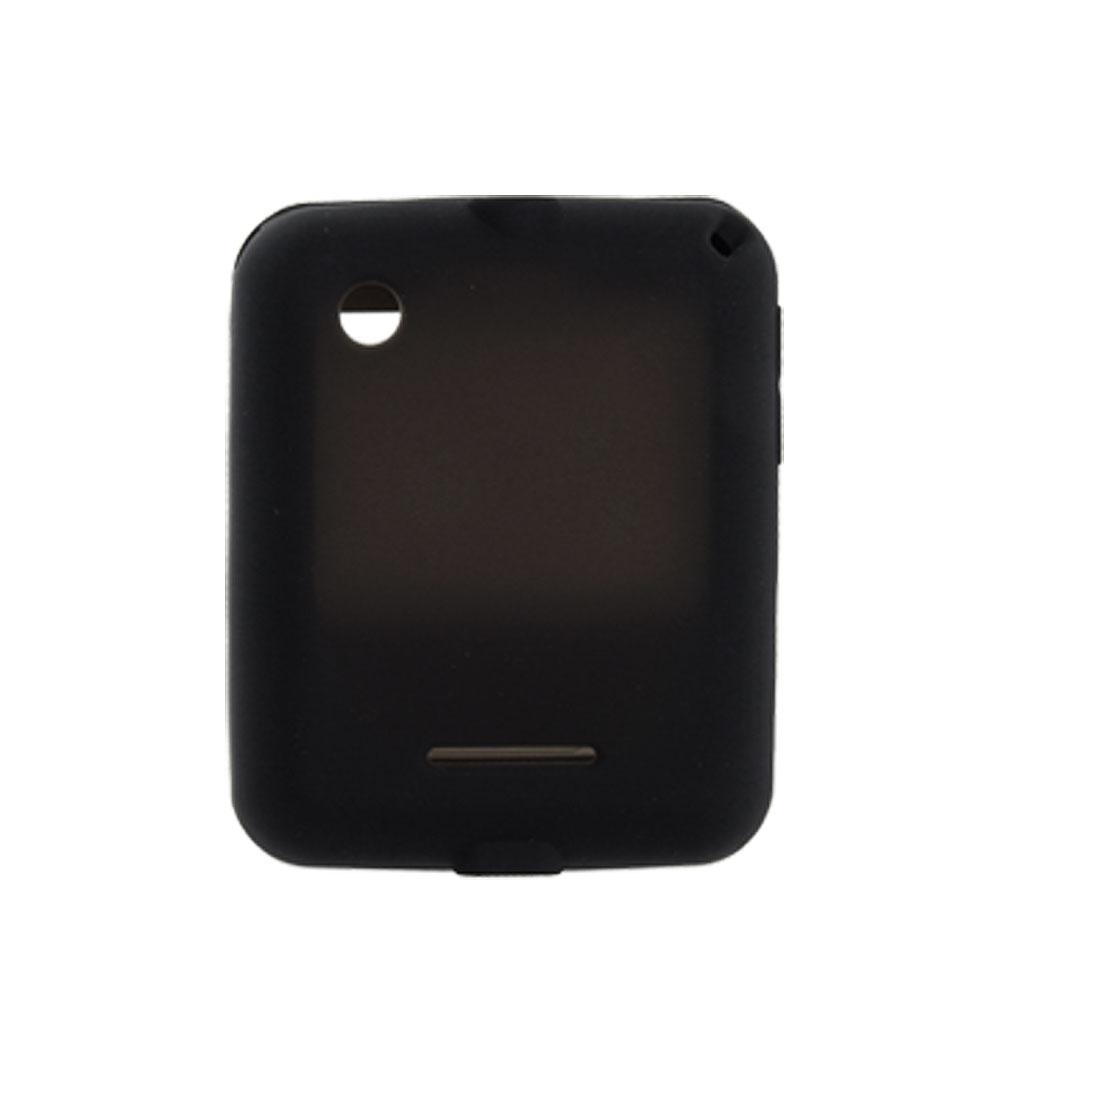 Black Silicone Protective Cover Skin for Motorola A45 Motocubo